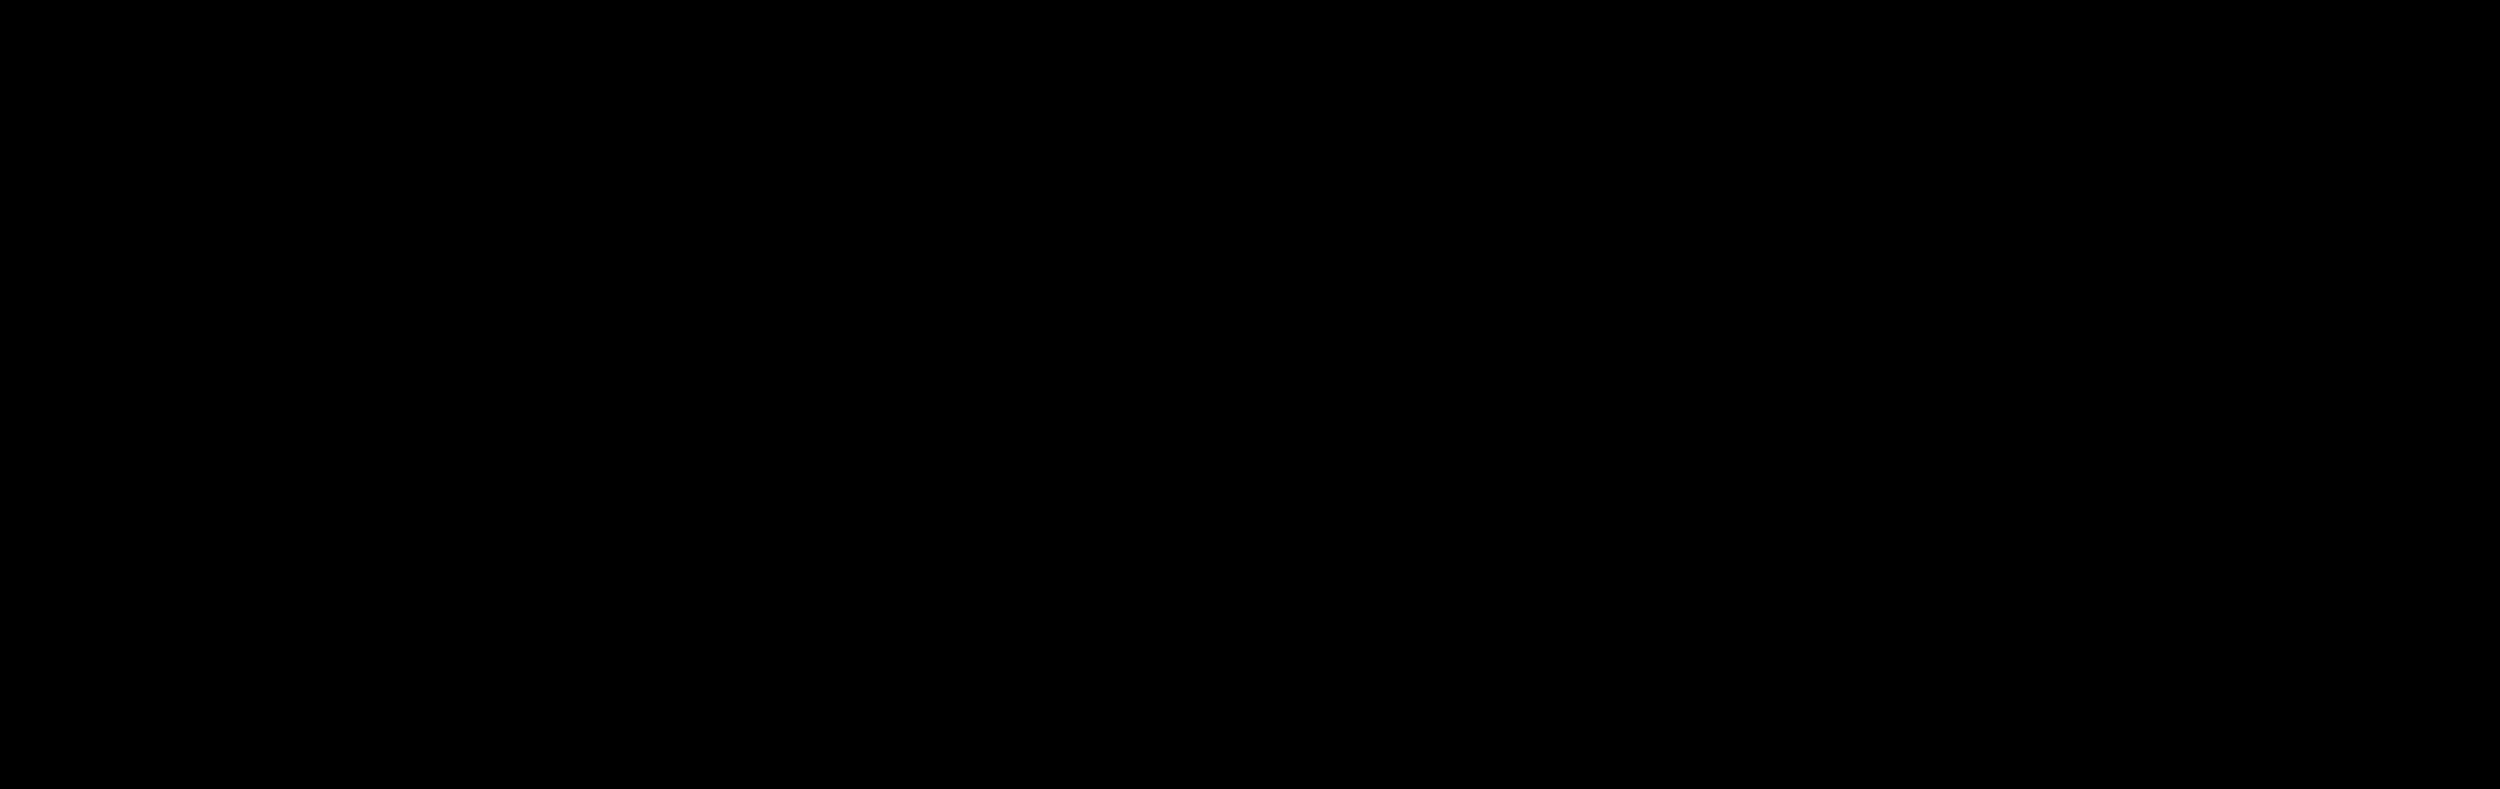 Exeger-Logo-Lockup-Wide.png